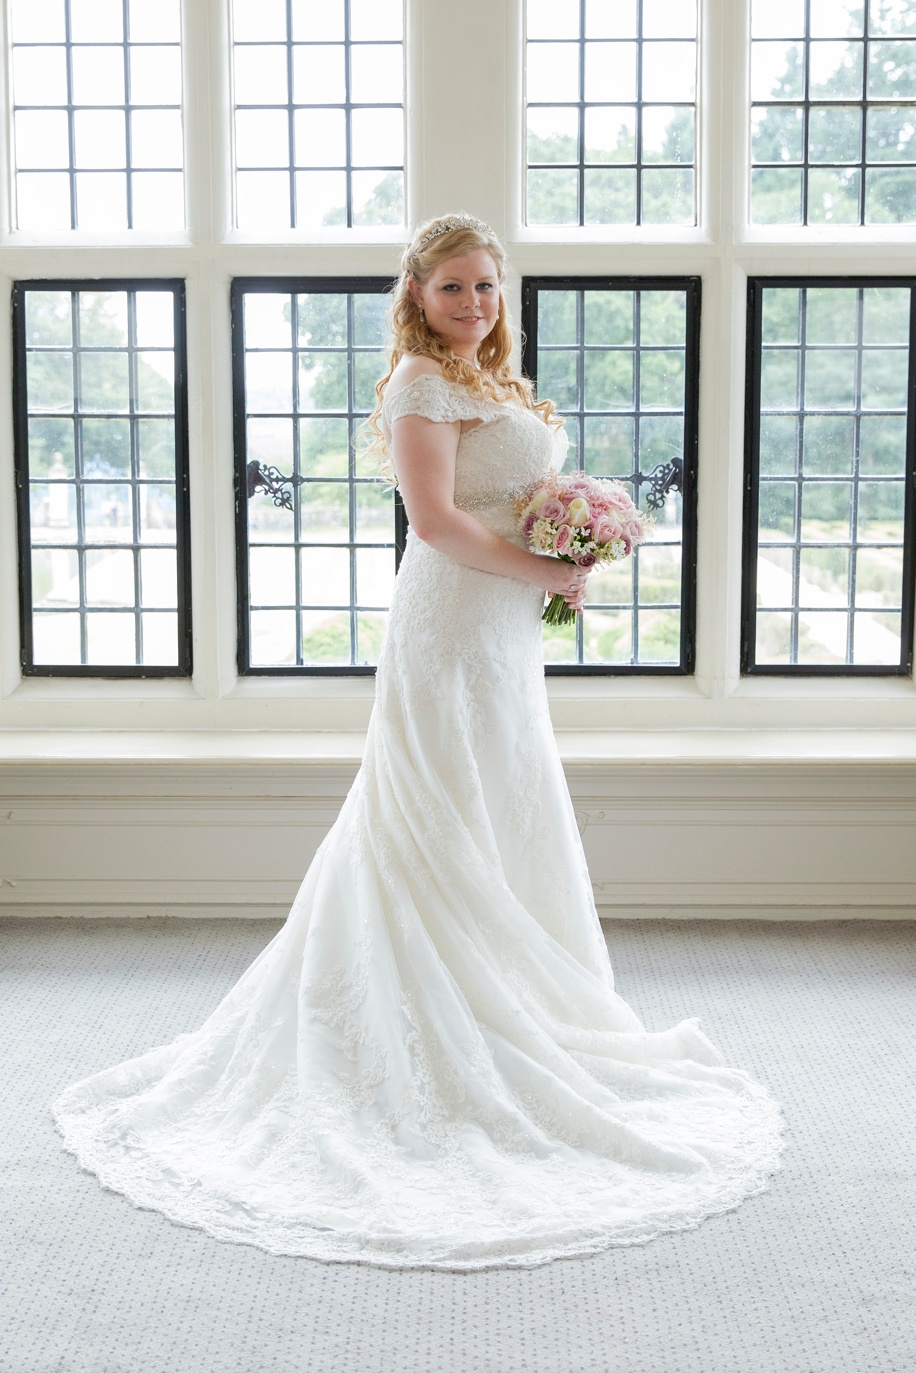 Beautiful Bridal photography at a Rhinefield House wedding